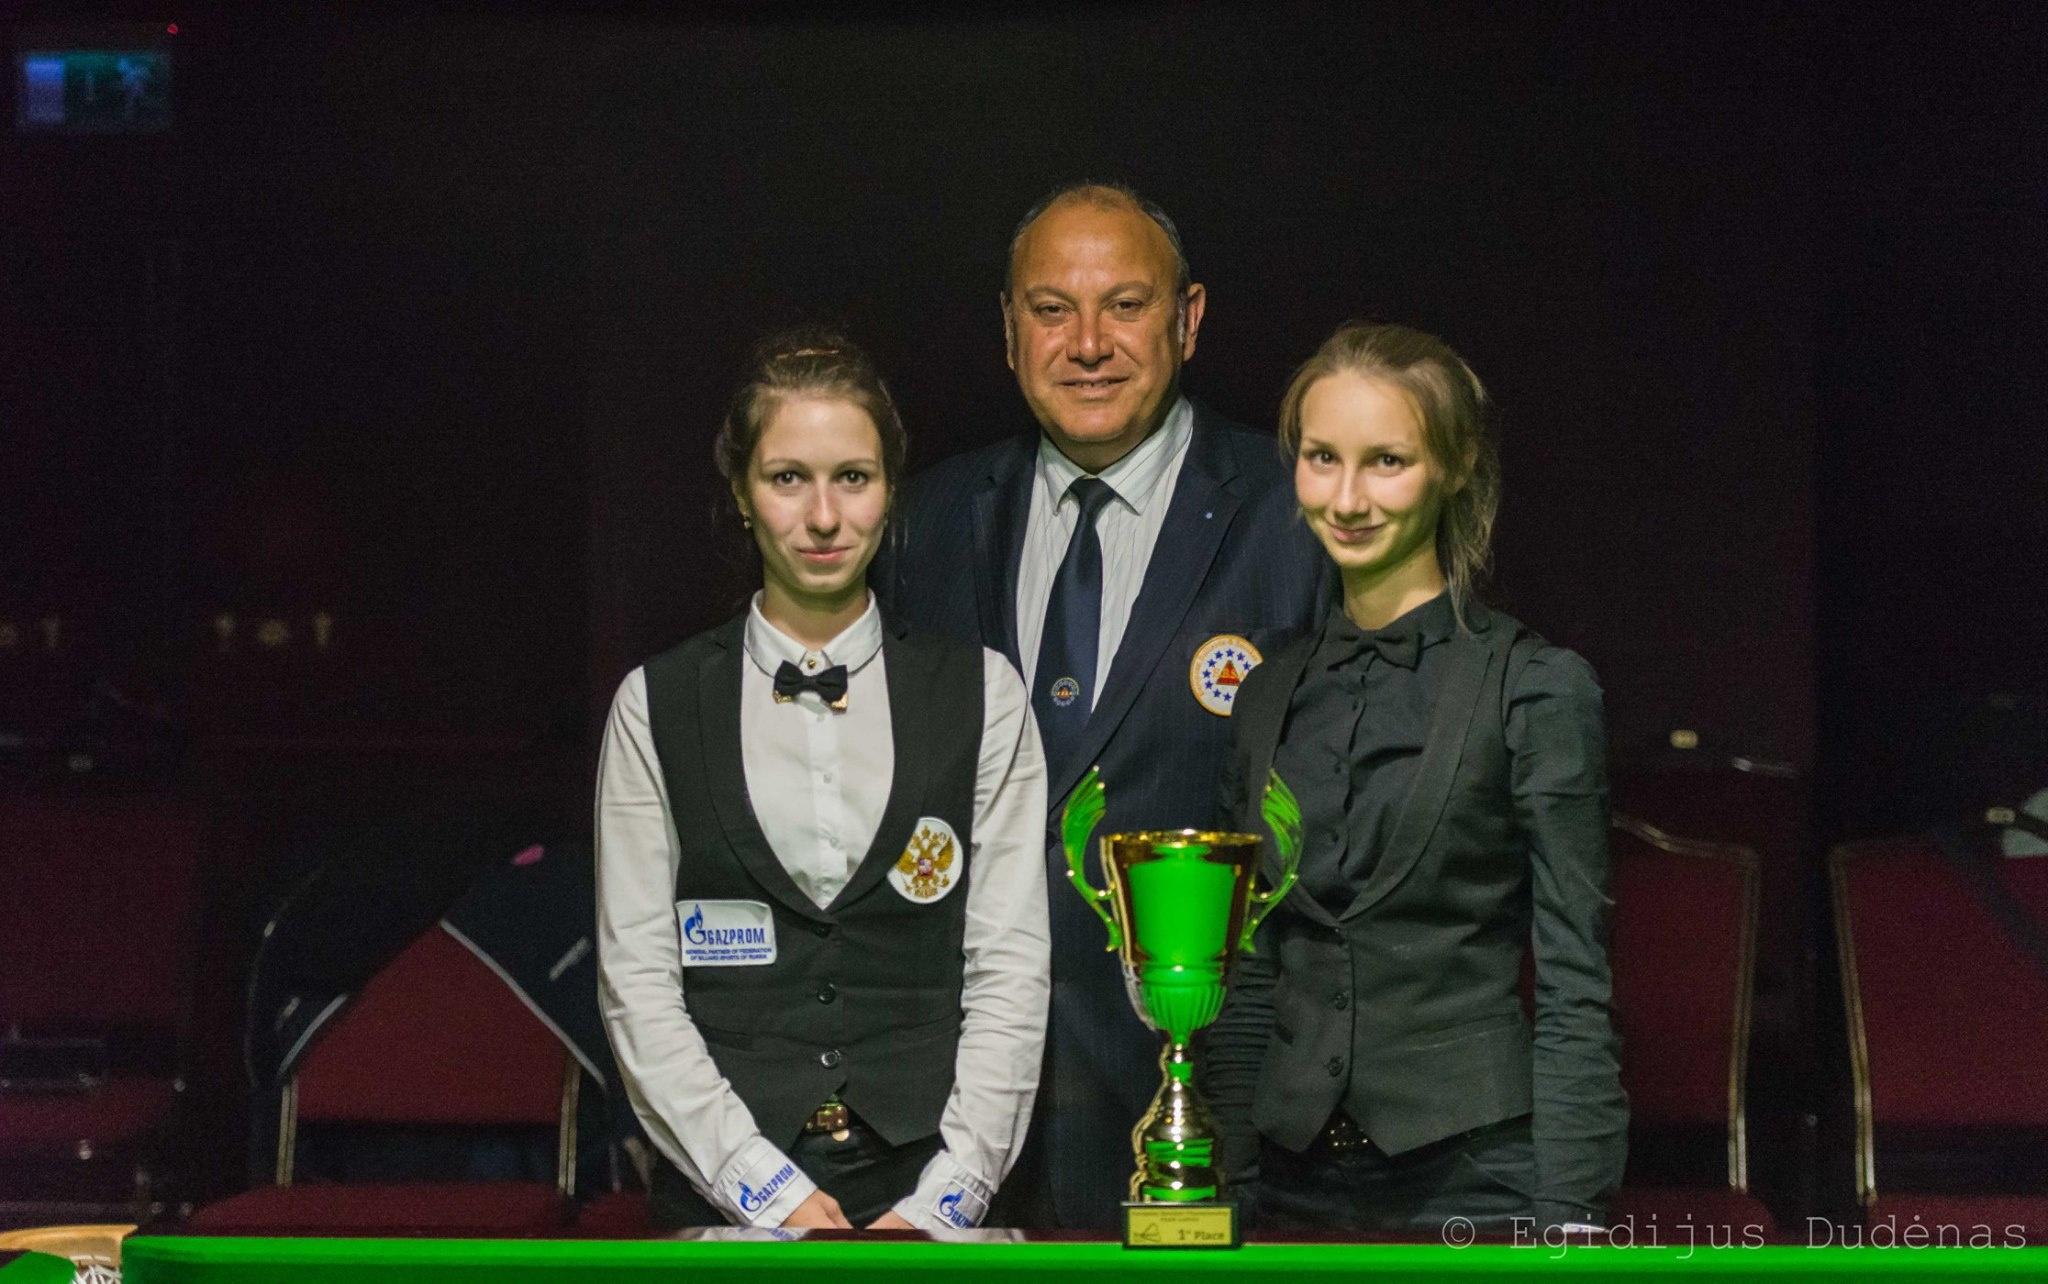 Russia's team wins the Ladies Team title.